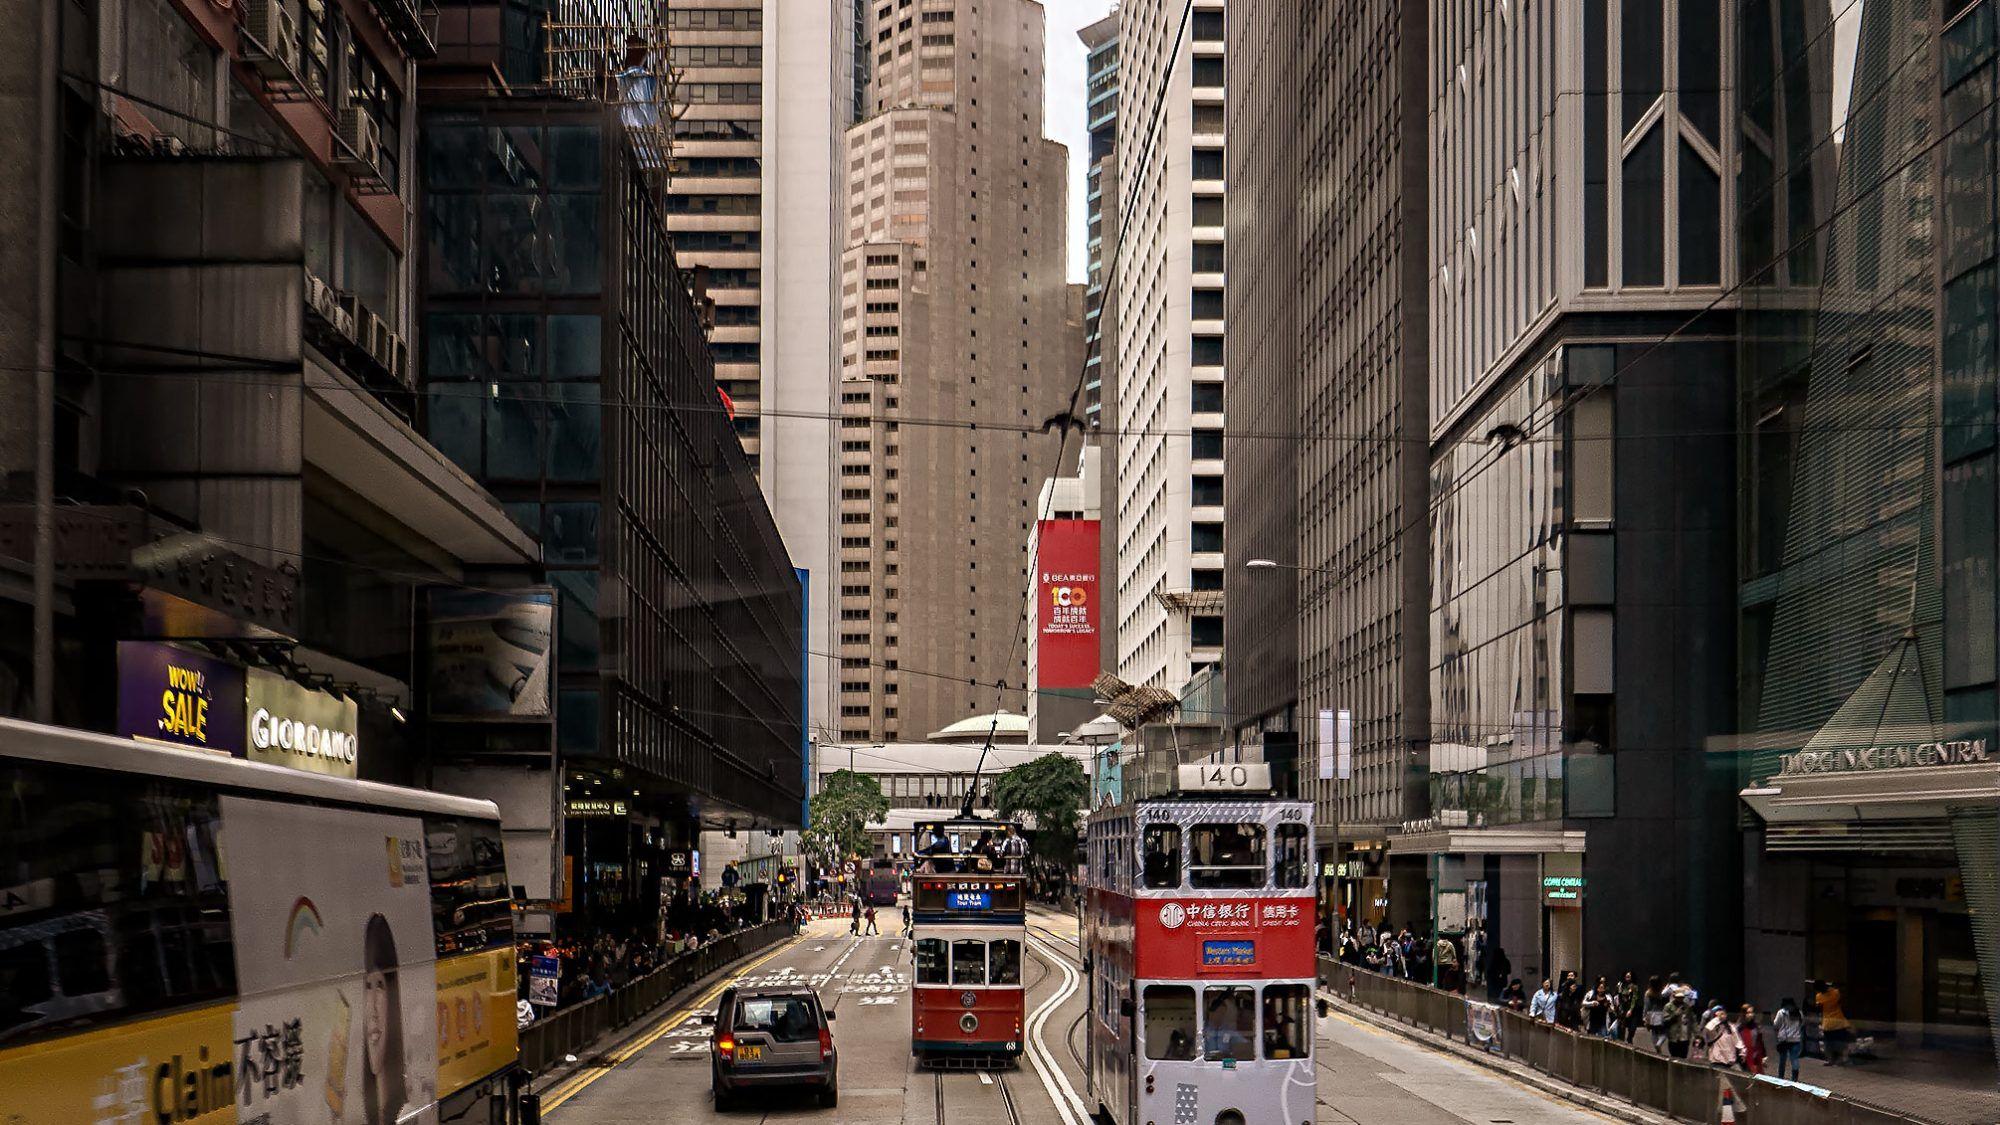 tramway in Hong Kong